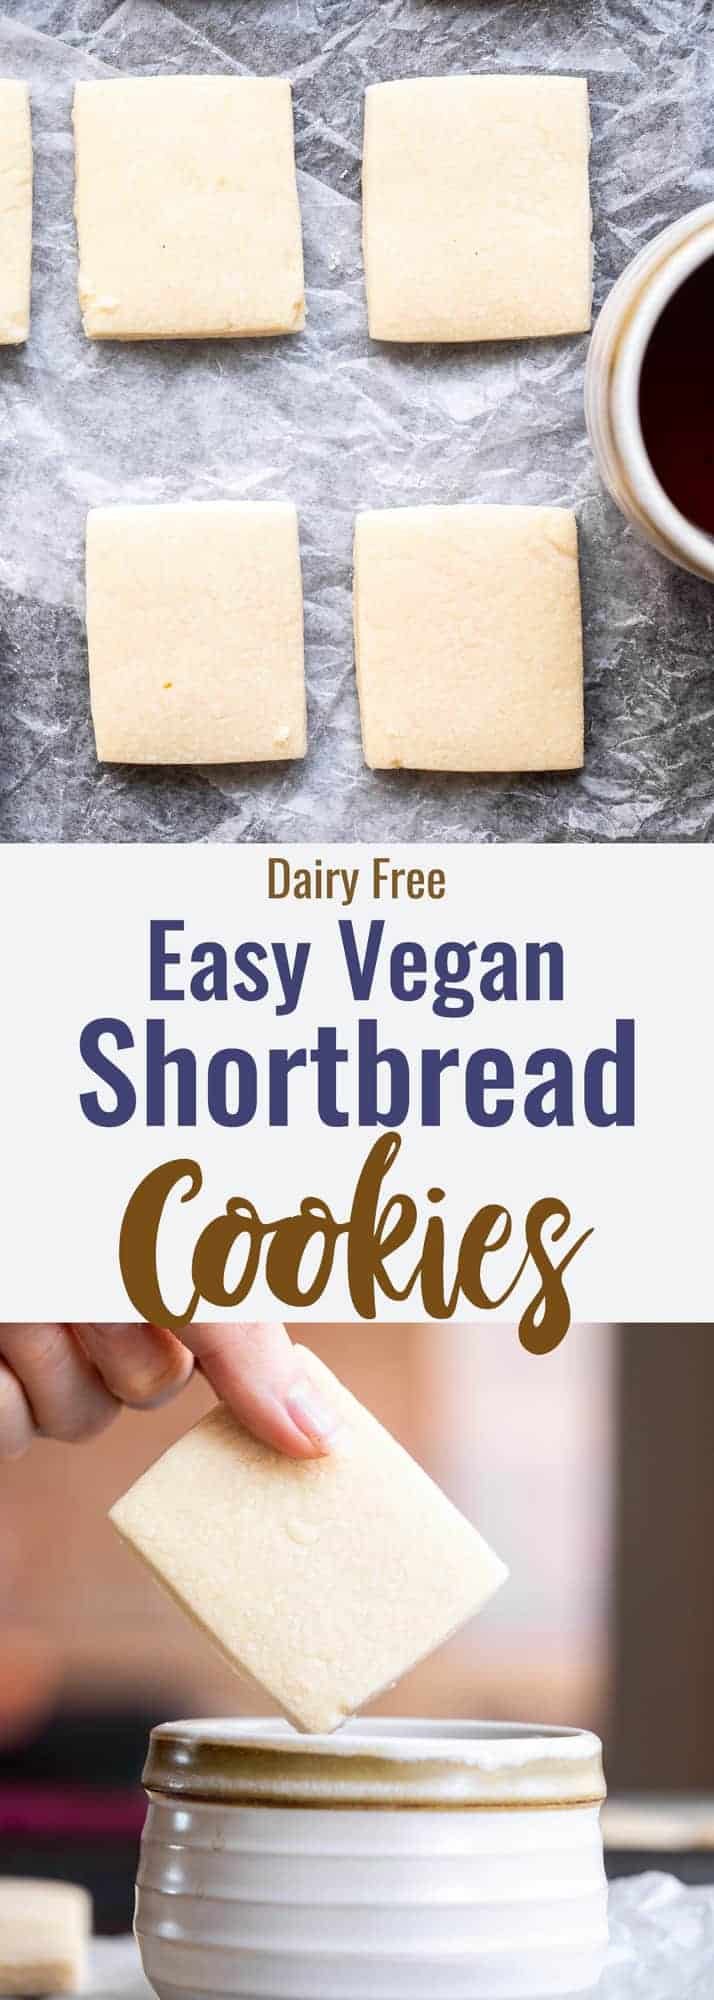 Dairy Free Vegan Shortbread Cookies Food Faith Fitness